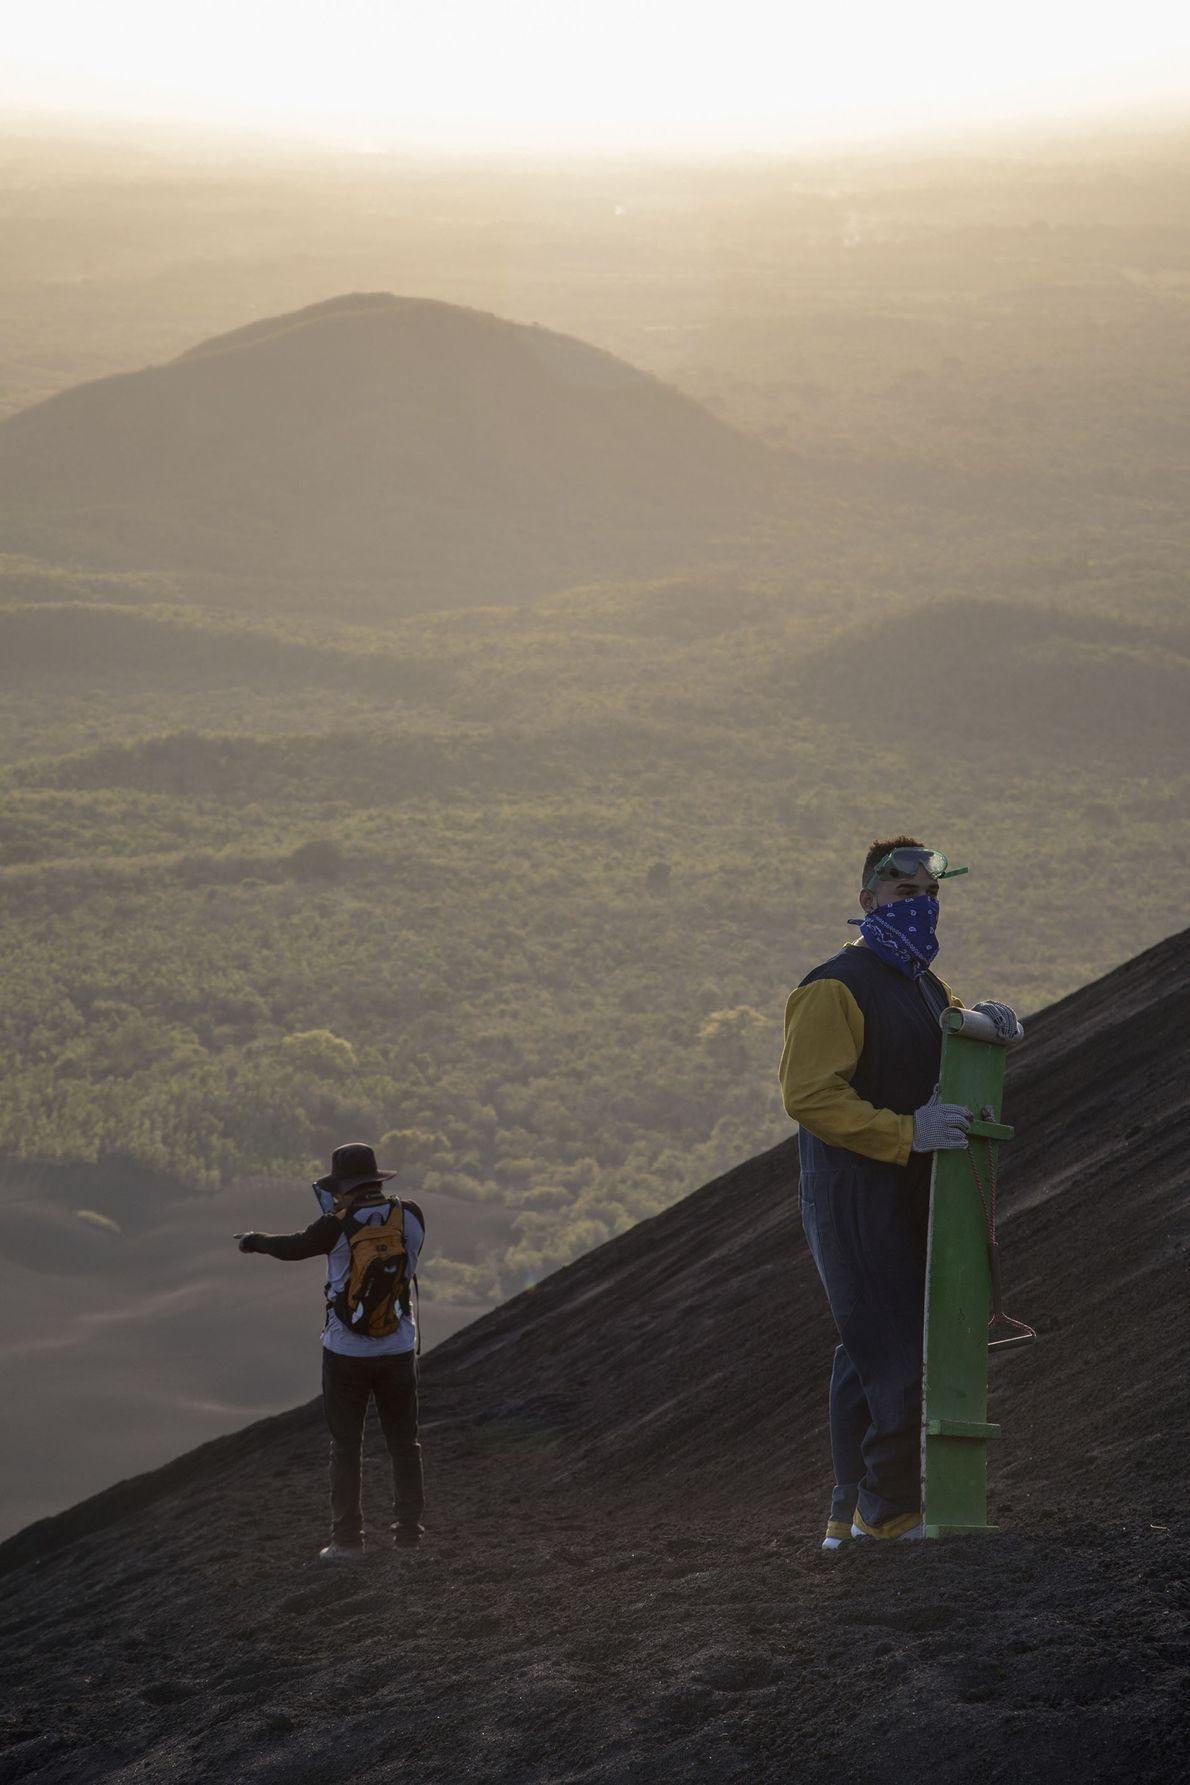 Sandboarders on the slopes of Cerro Negro